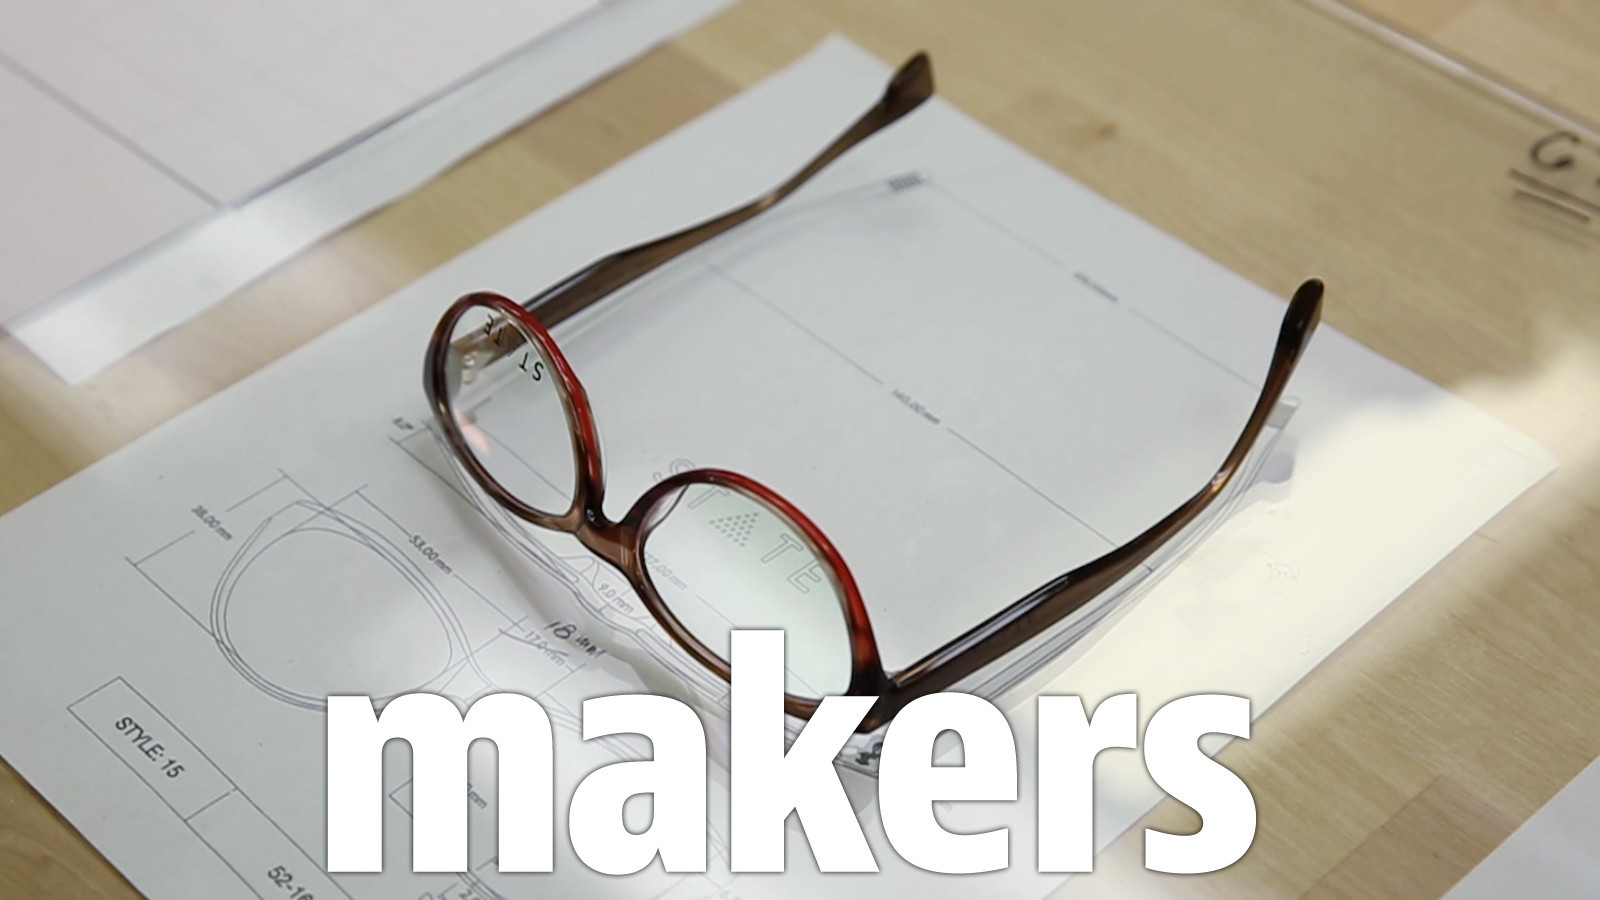 0792042e65 Inside a Chicago-area workshop where trendy eyeglasses take shape - Chicago  Tribune